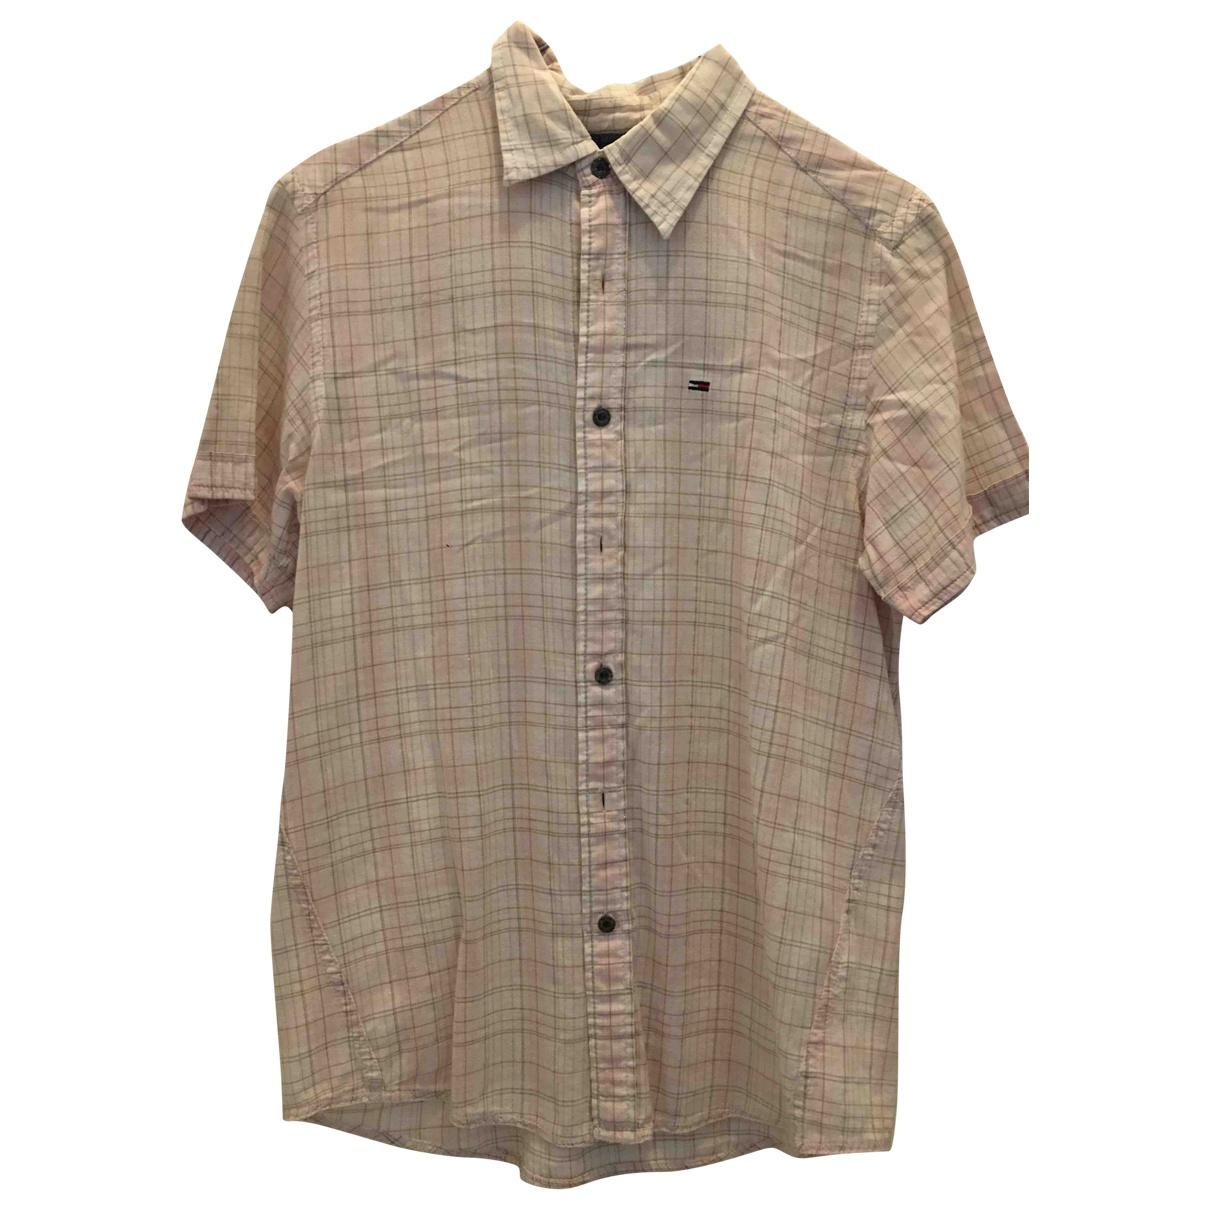 Tommy Hilfiger N Pink Cotton Shirts for Men S International